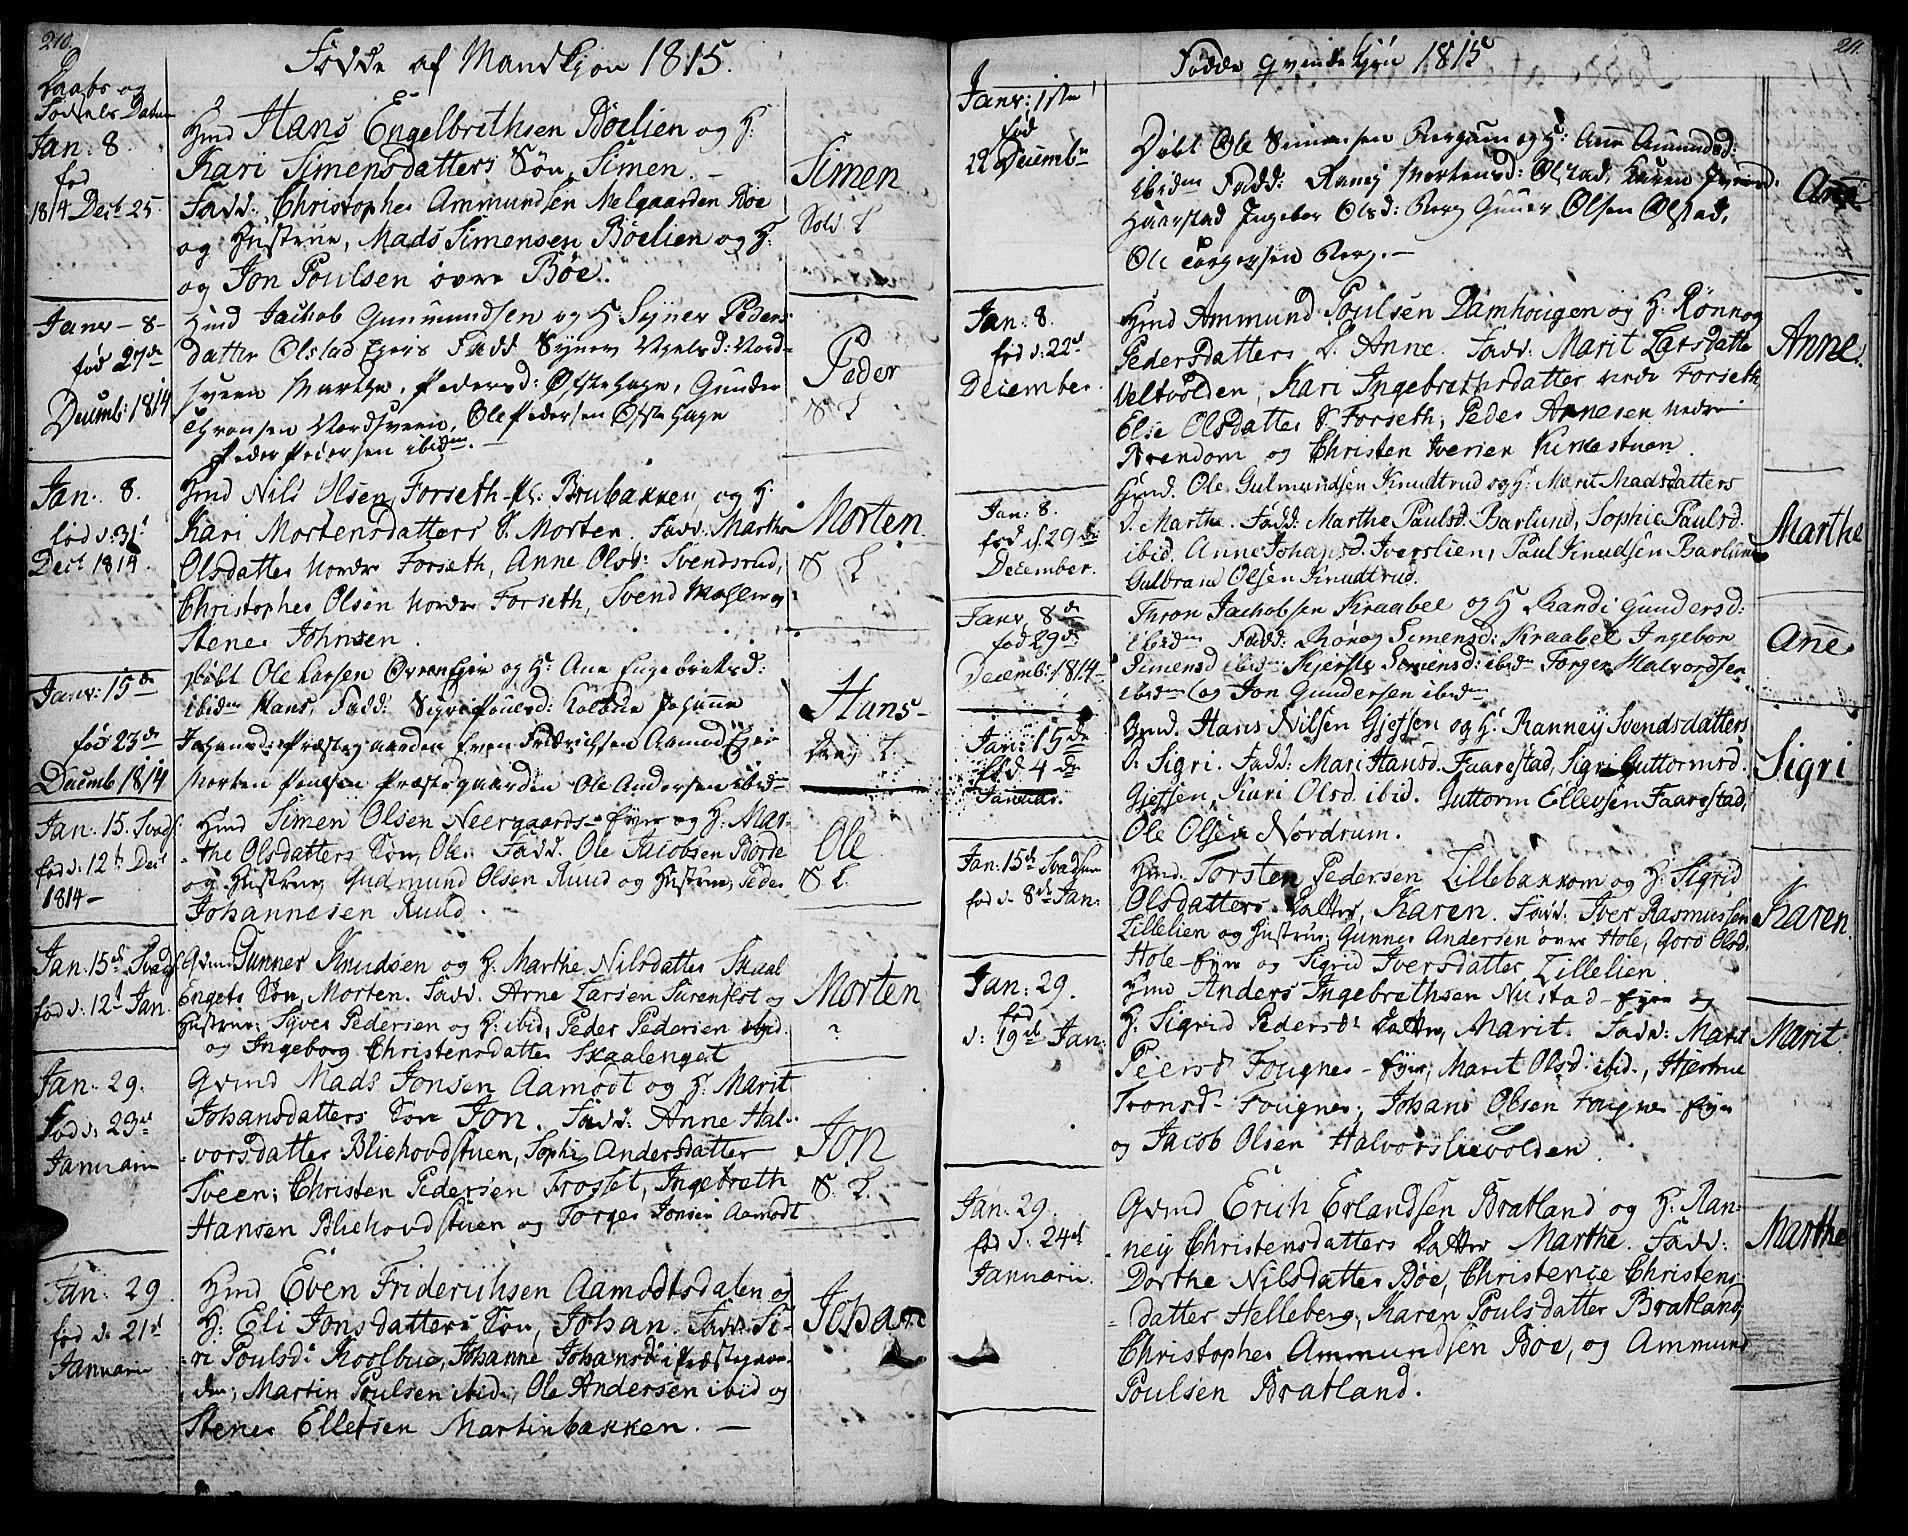 SAH, Gausdal prestekontor, Ministerialbok nr. 4, 1809-1817, s. 210-211